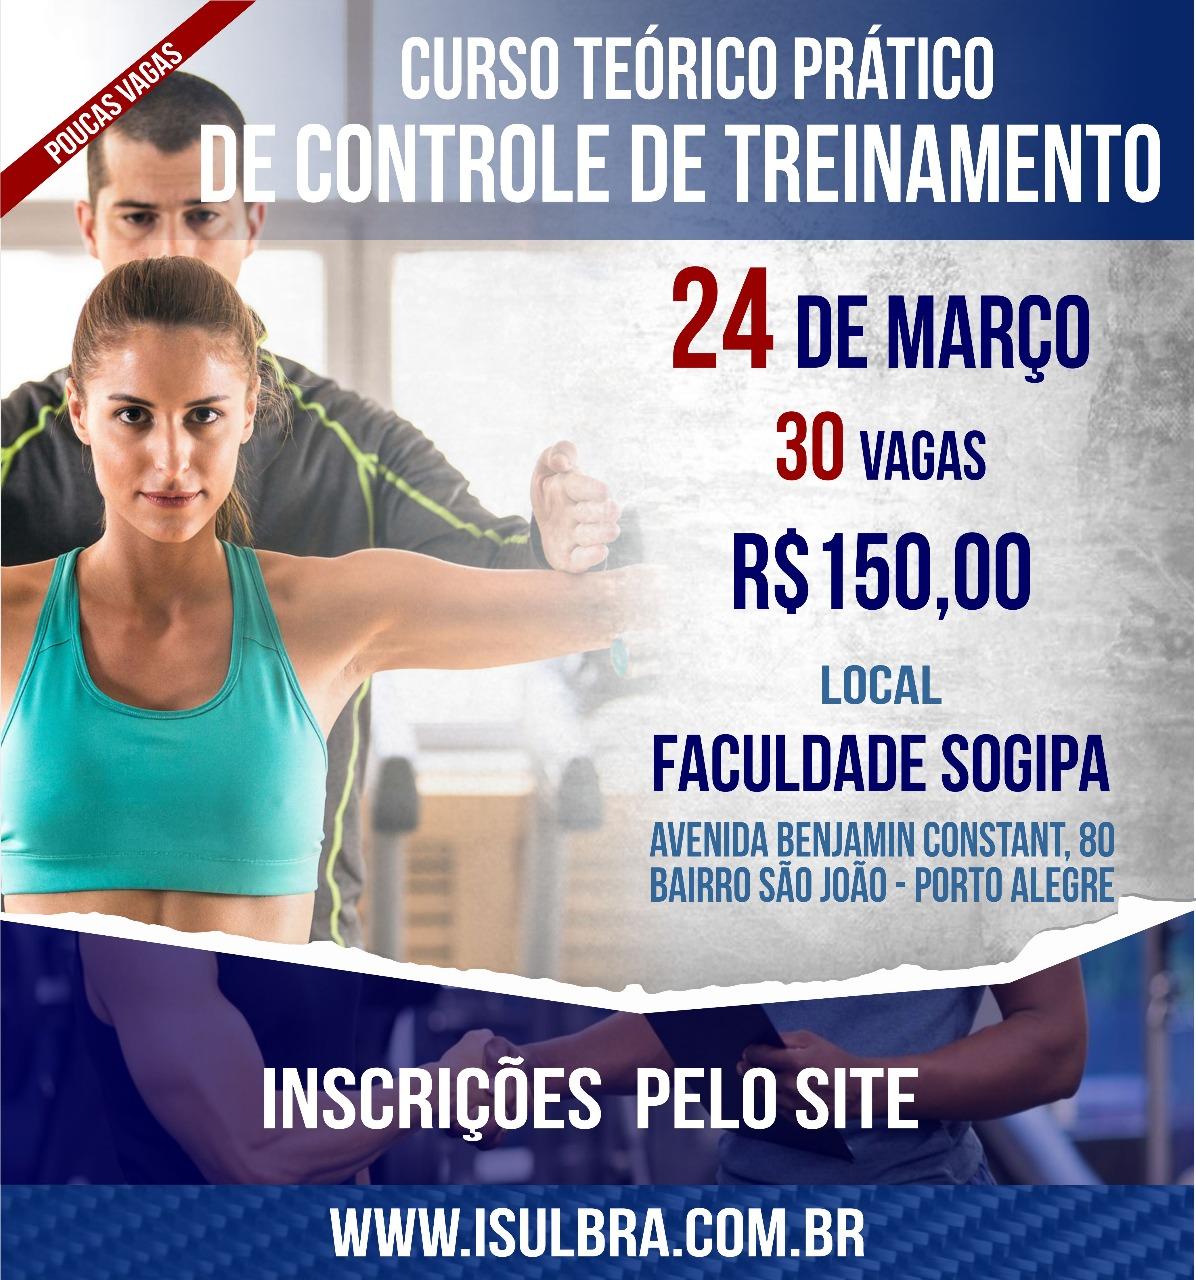 Curso para CURSO TEÓRICO/PRÁTICO DE CONTROLE DE TREINAMENTO